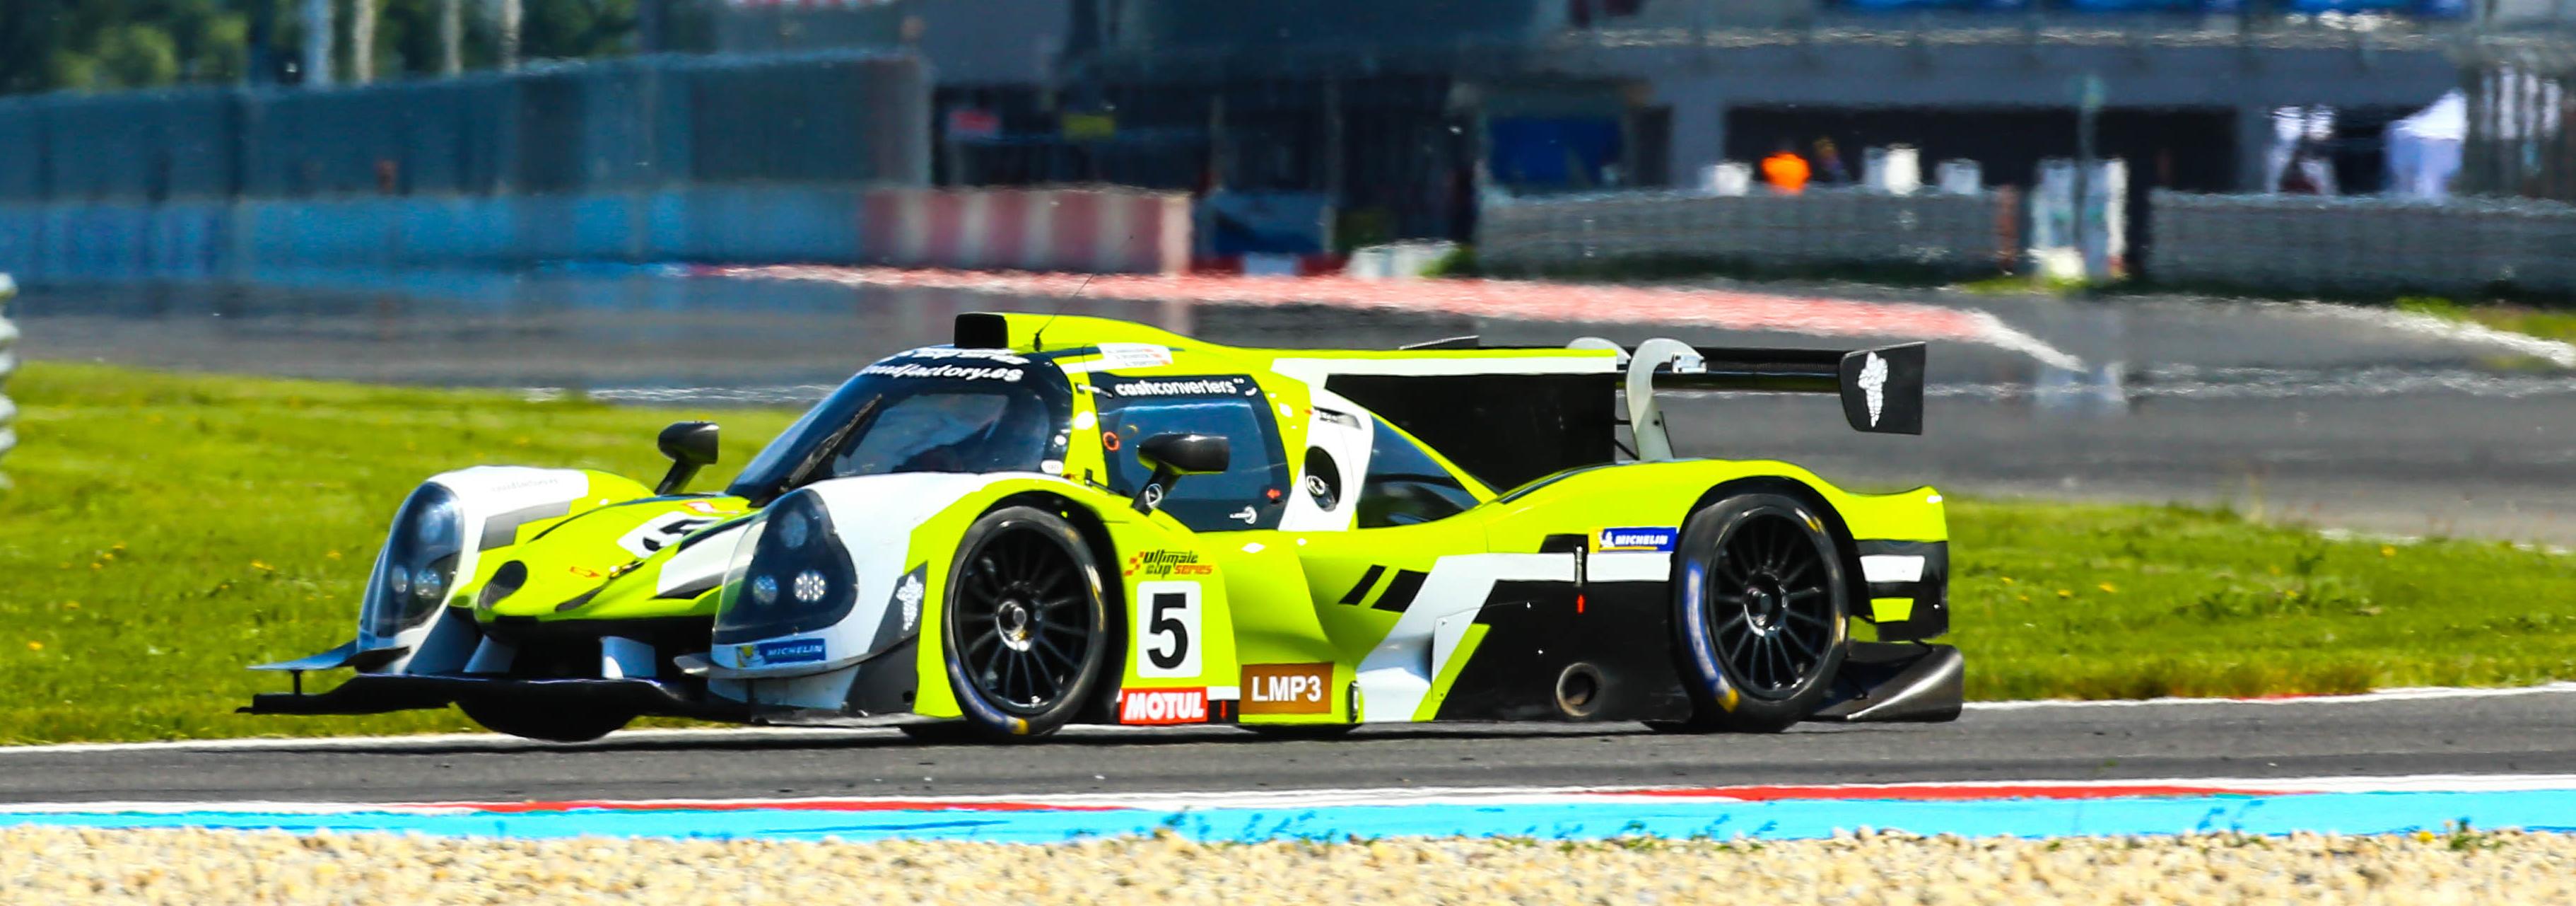 Speed_Factory_Ligier_JSP3_1